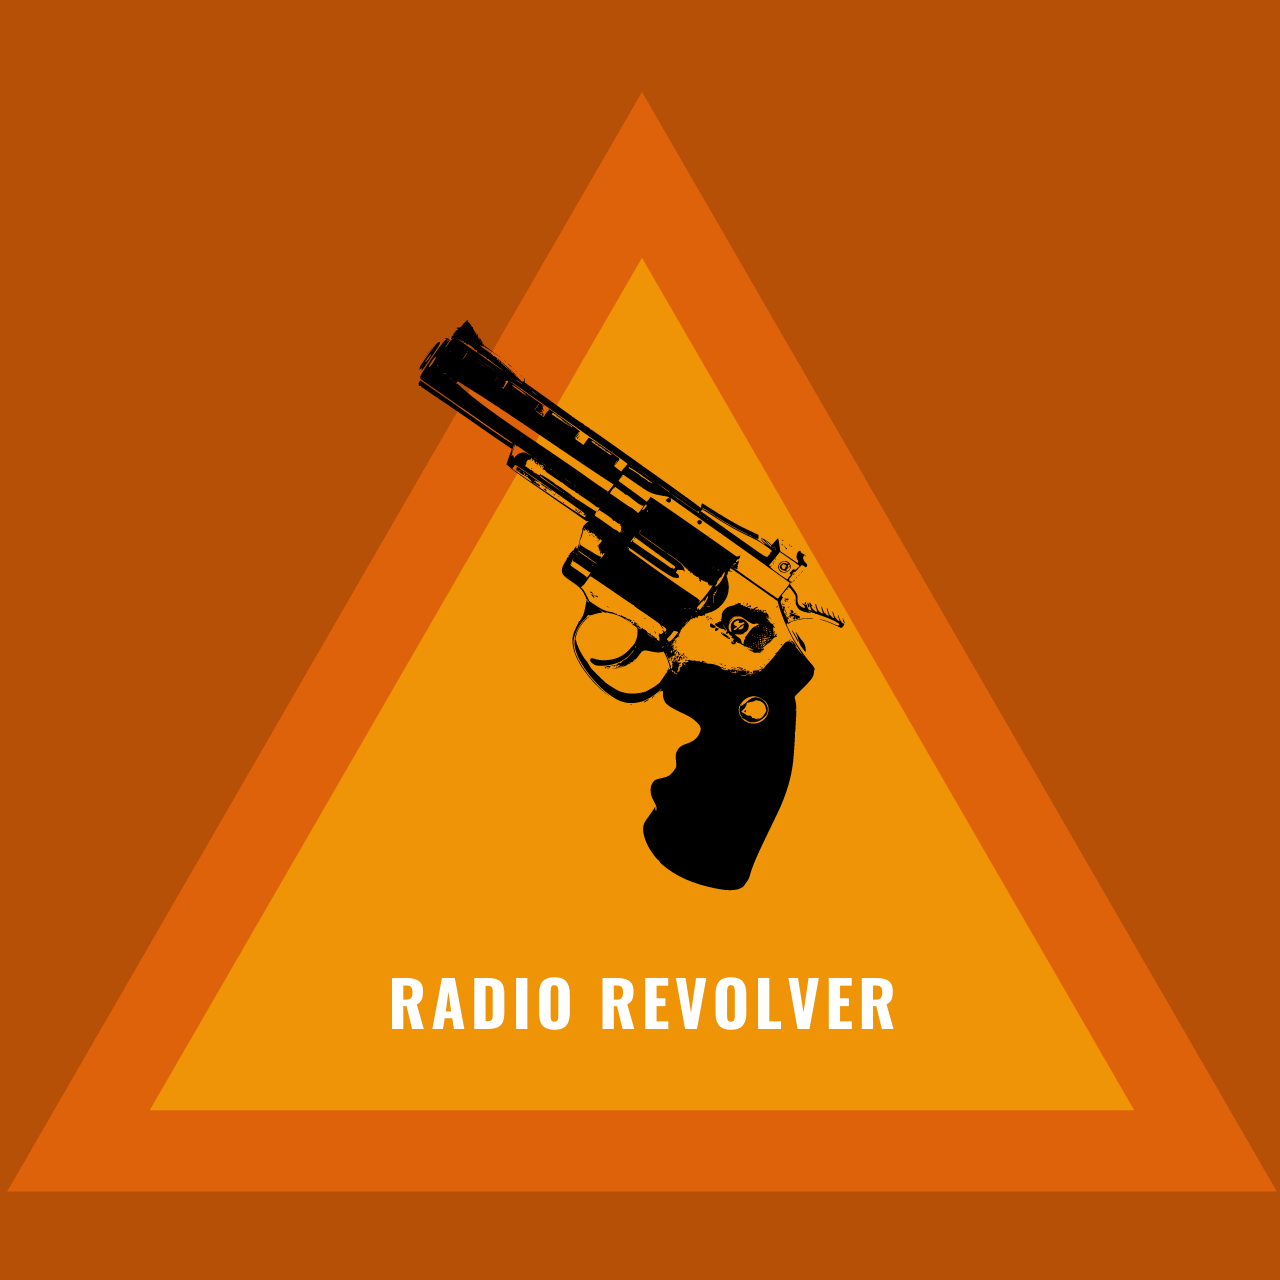 Radio Revolver